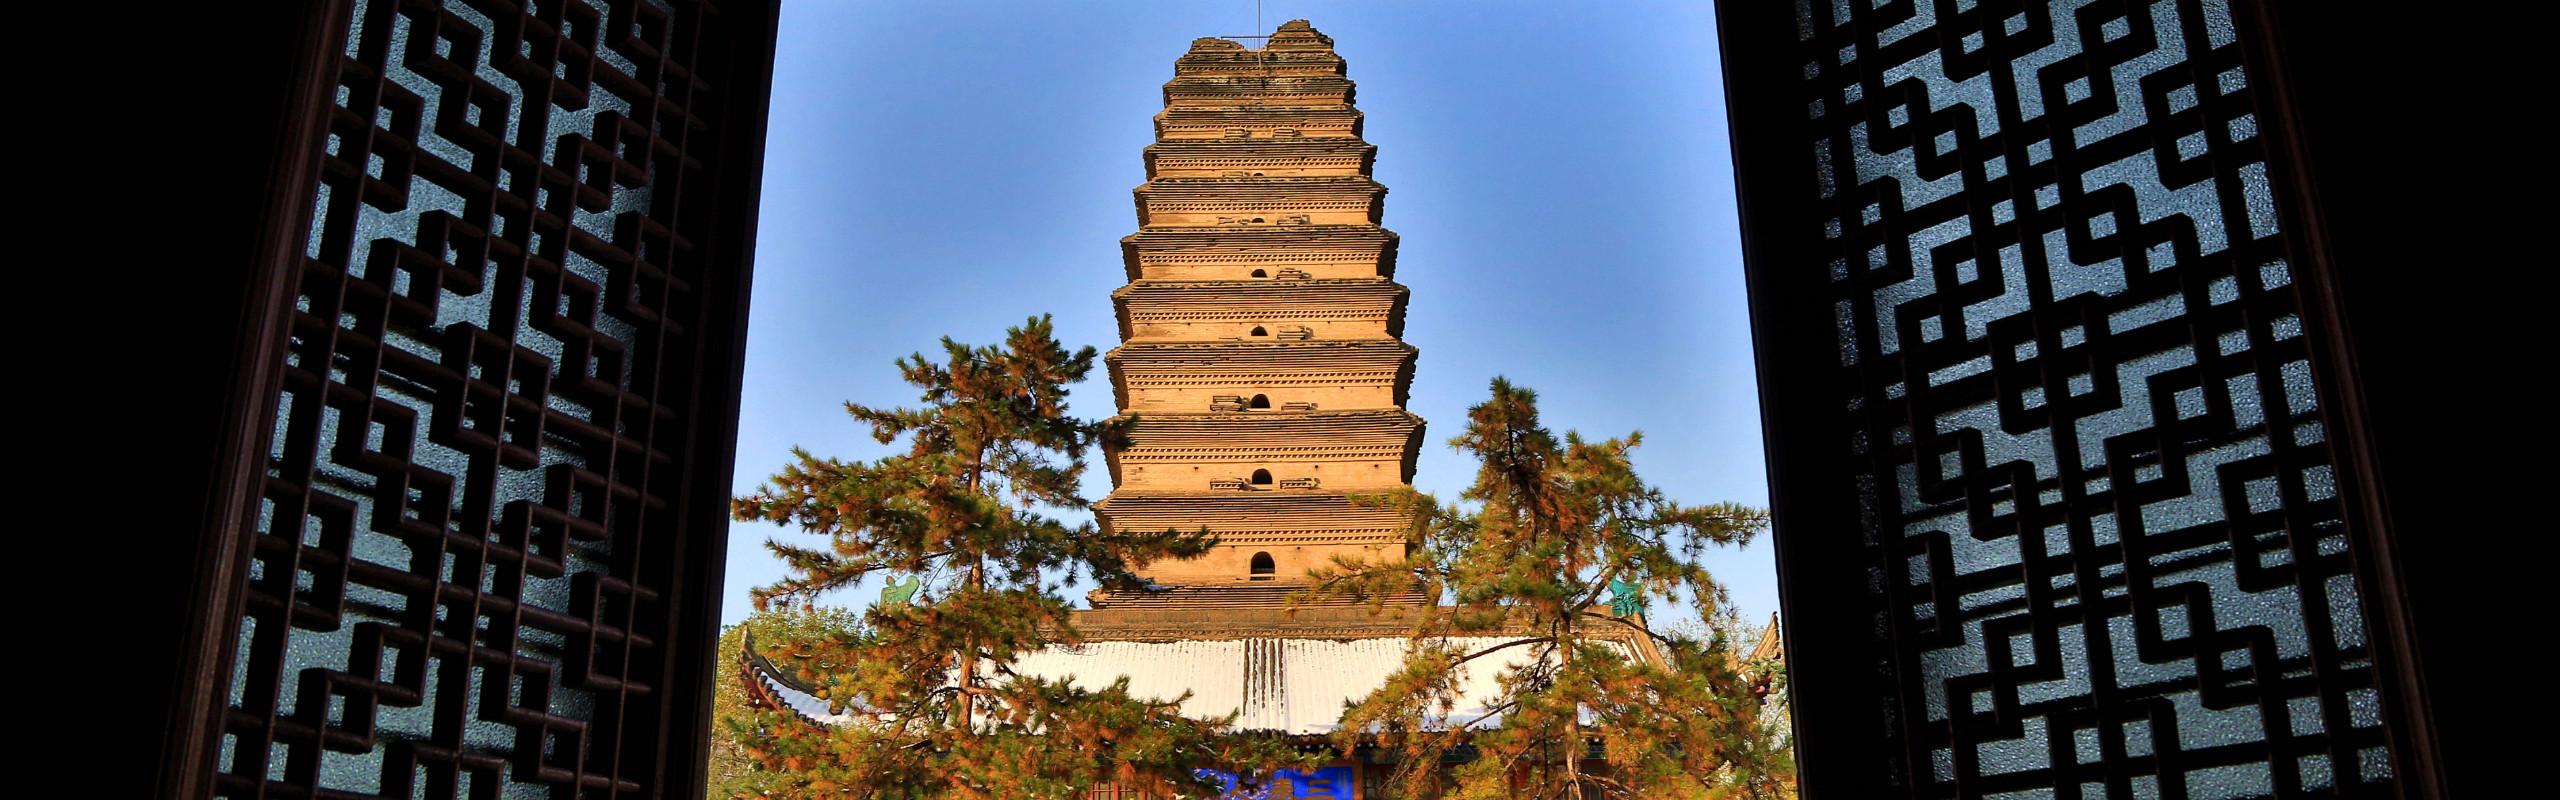 4-Day Xi'an Ancient Relics Tour